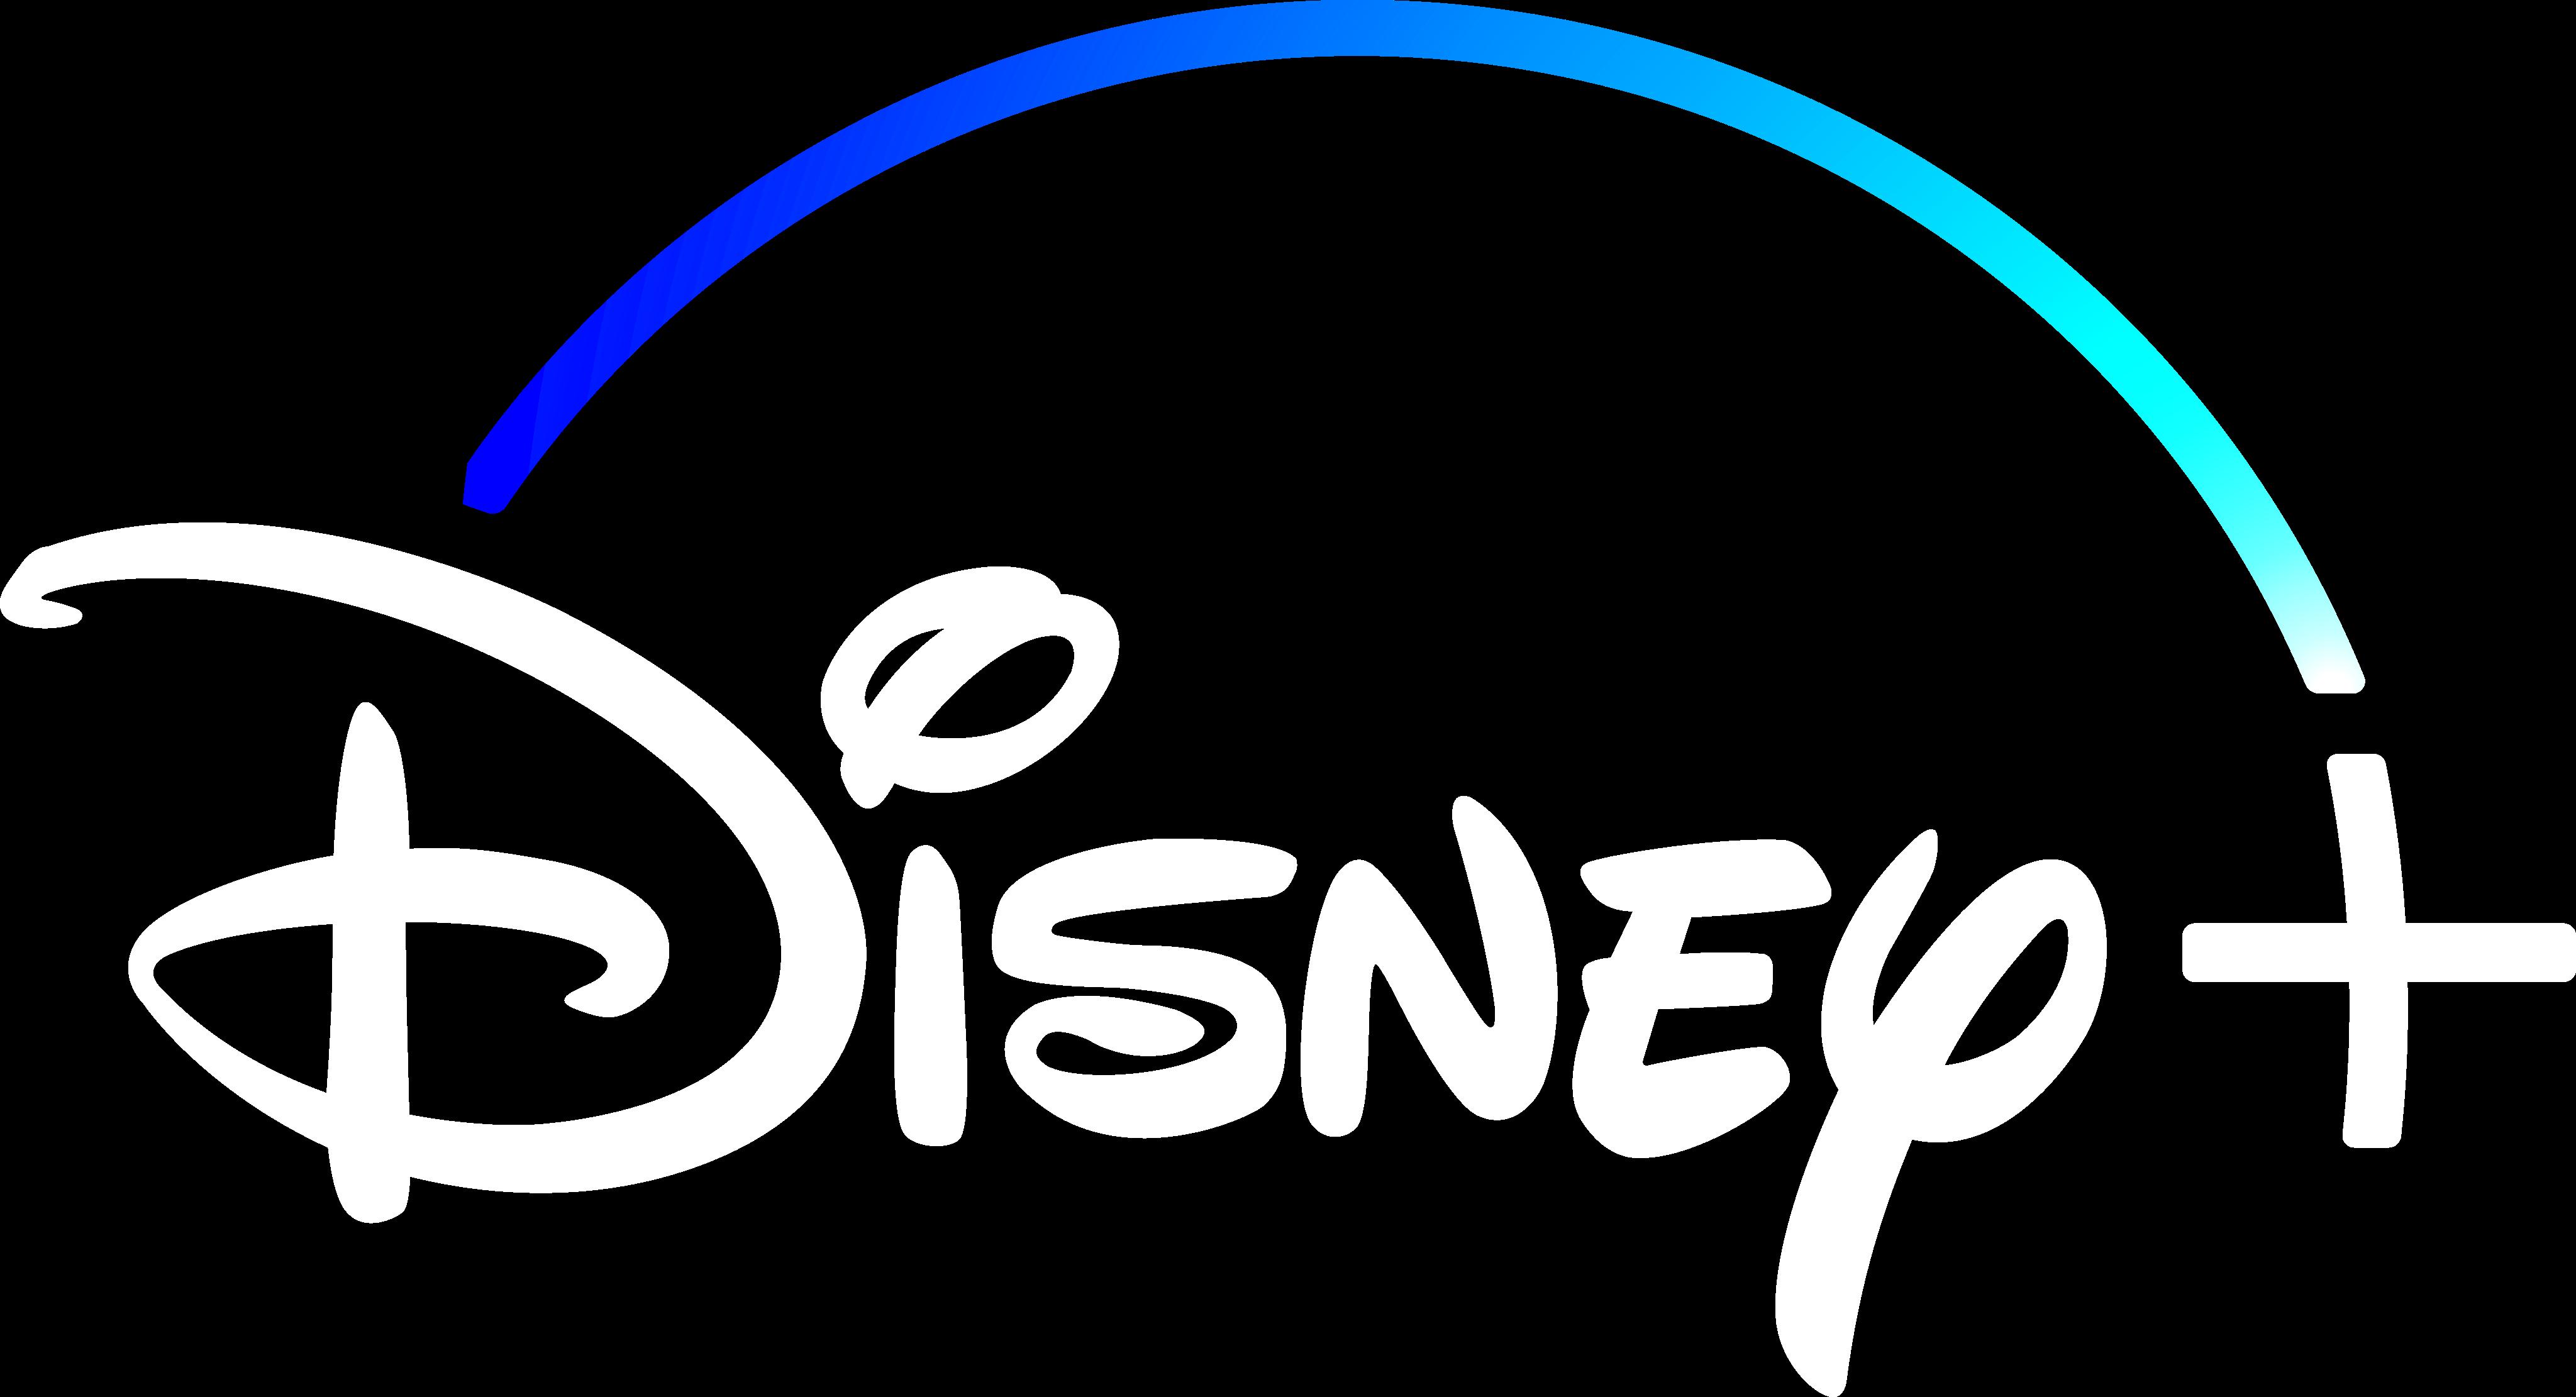 disney plus logo 1 - Disney+ Logo